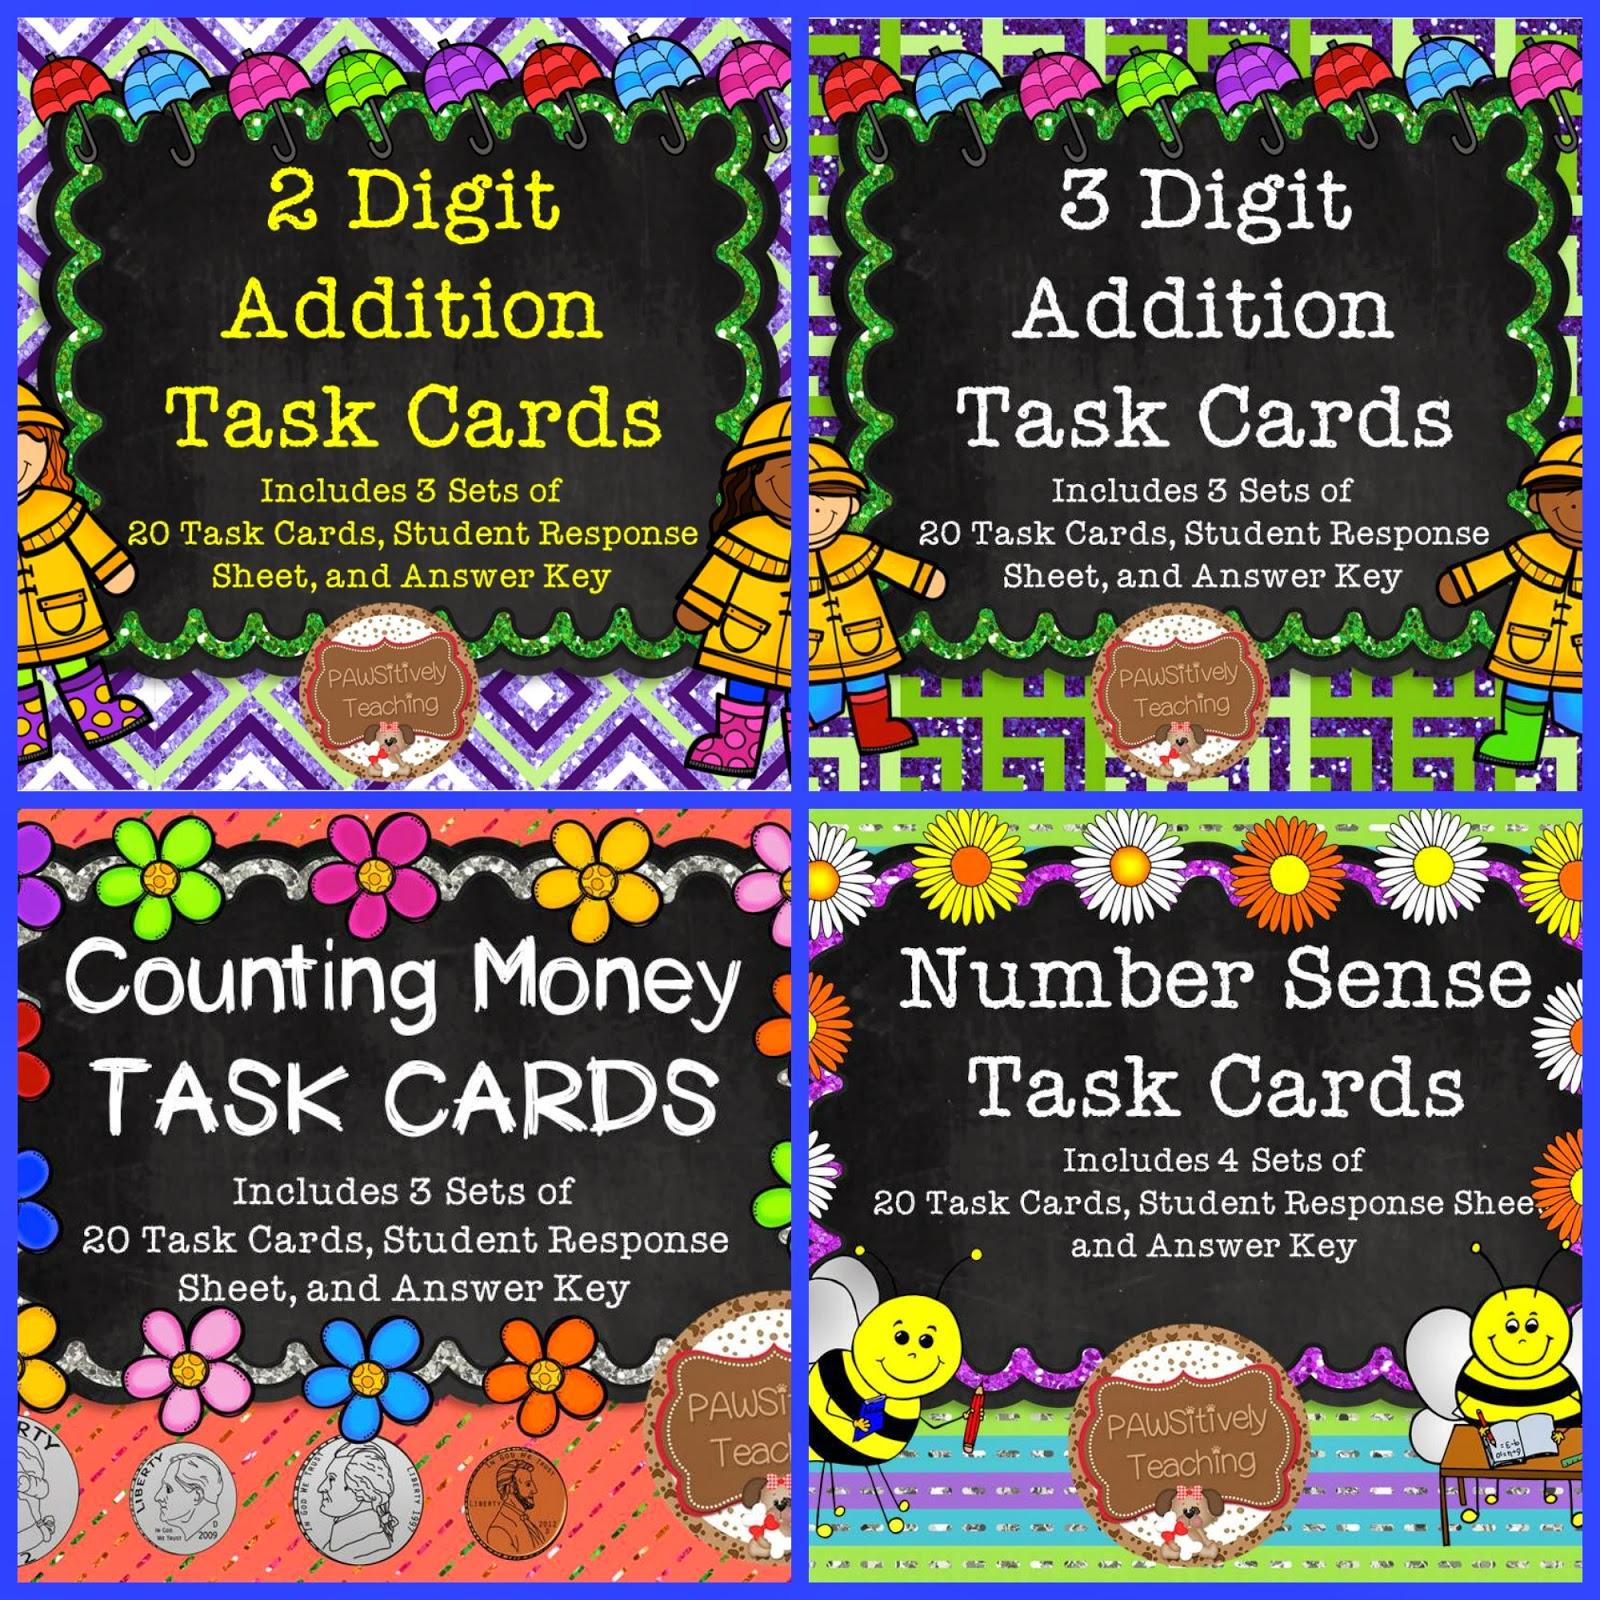 http://www.teacherspayteachers.com/Product/Math-Task-Card-Bundle-Spring-Themed-for-the-Primary-Grades-1133961